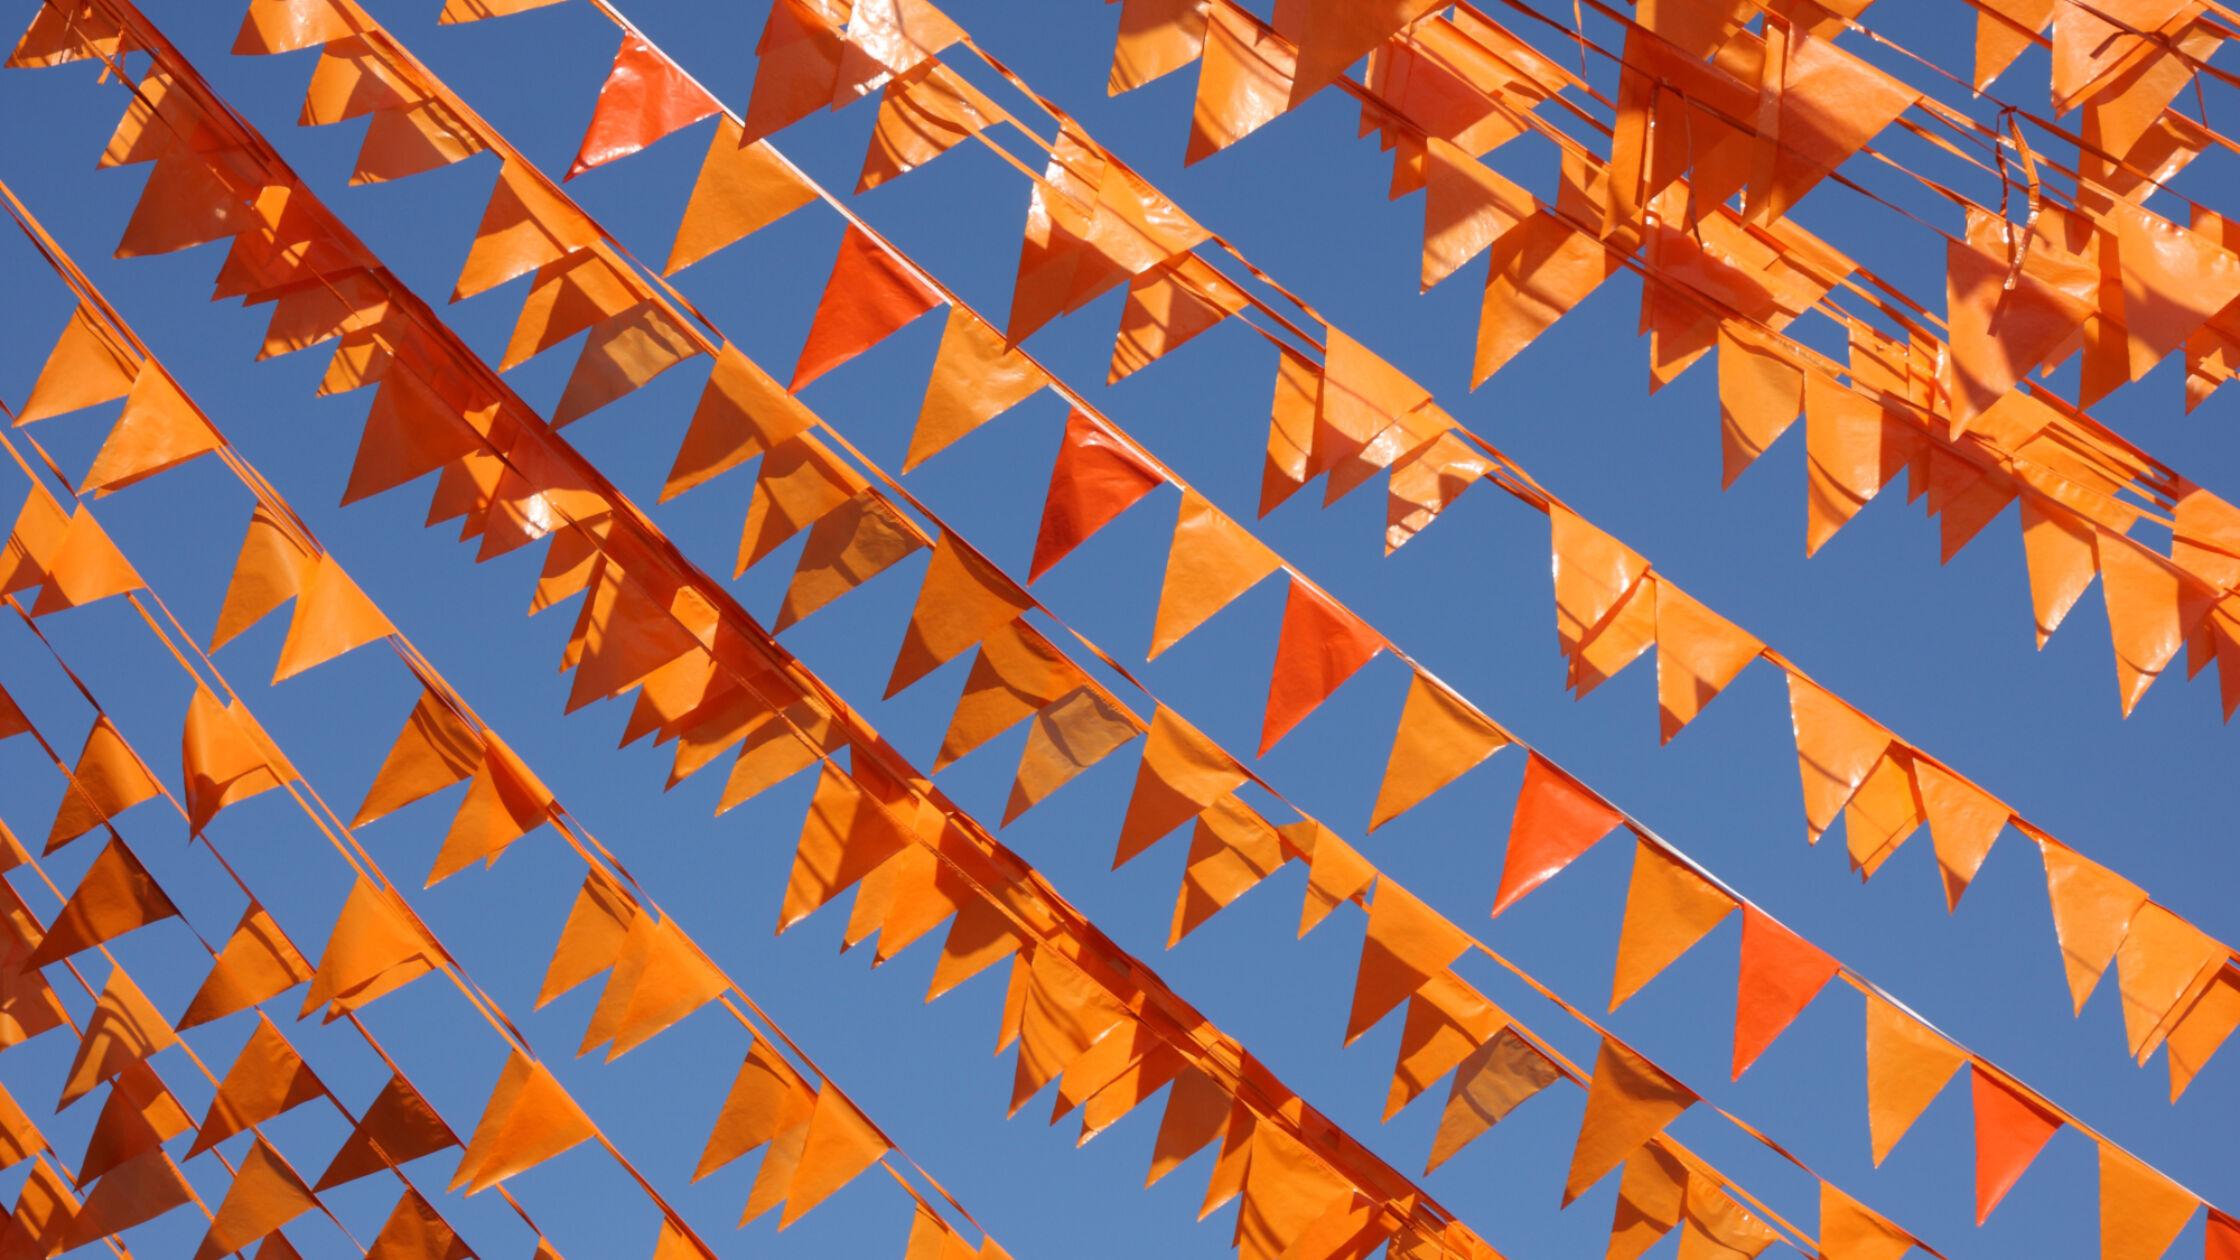 Oranje boven tijdens deze Koningslopen!